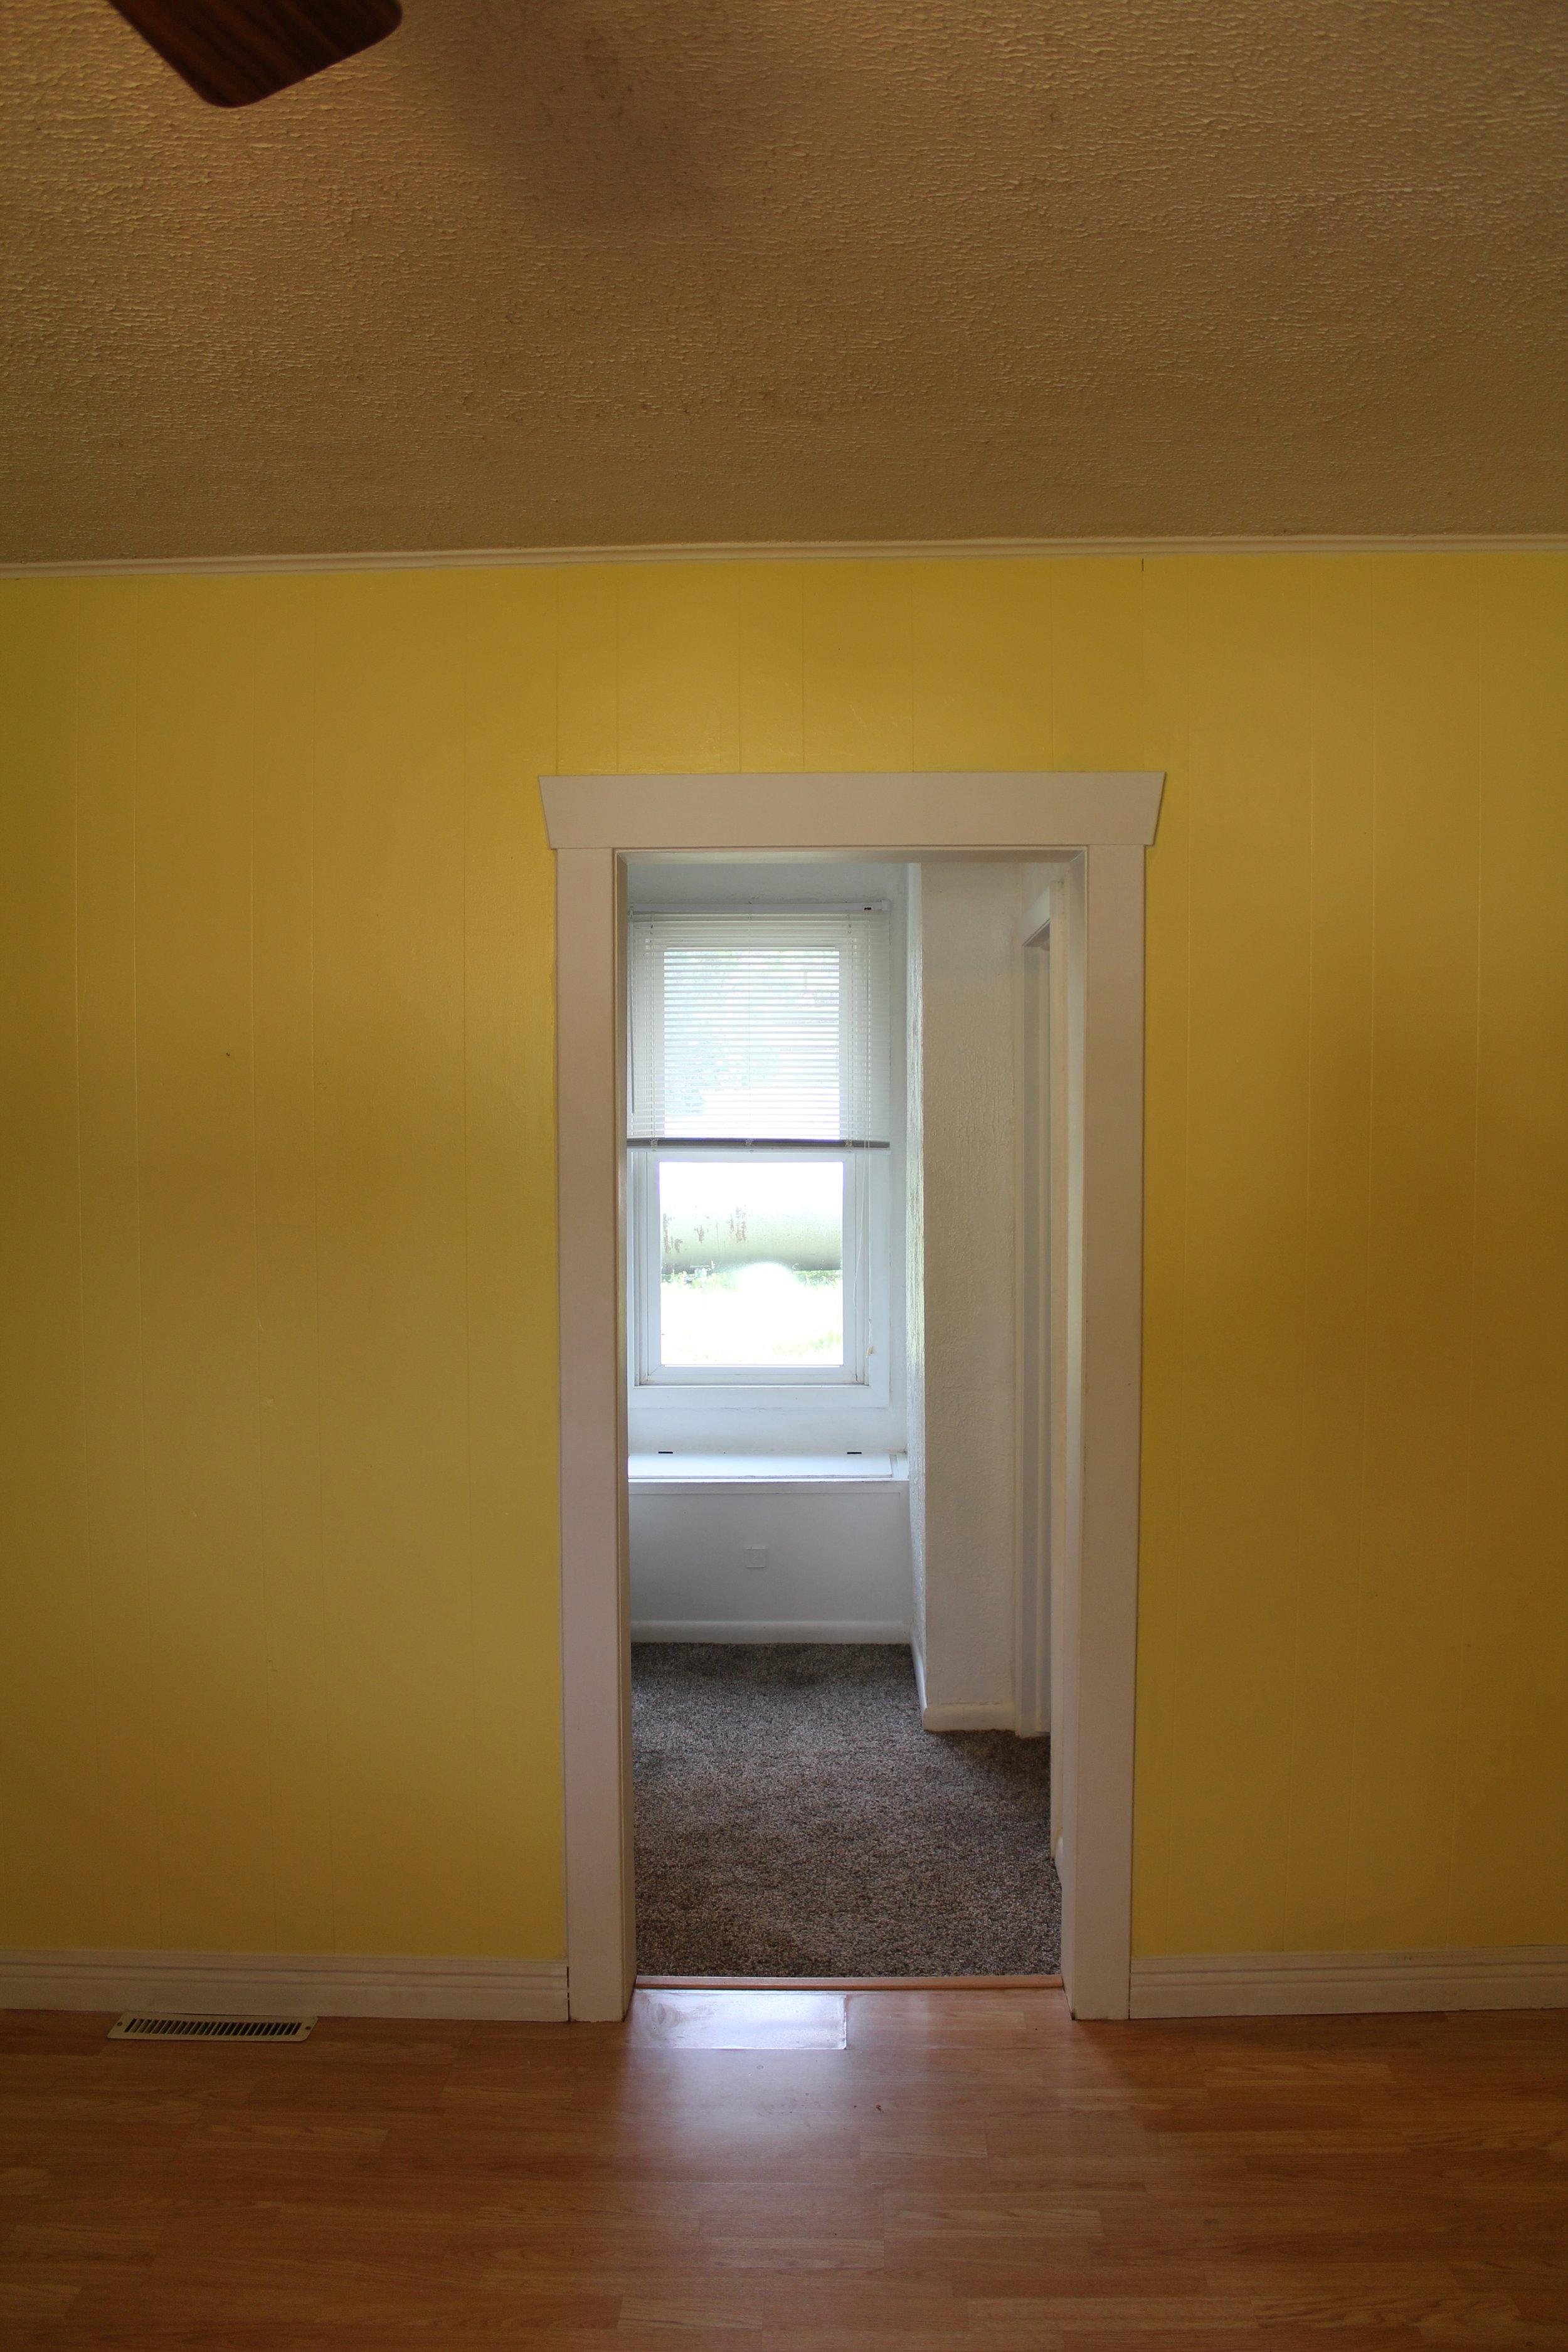 The hallway before....hello yellow walls!